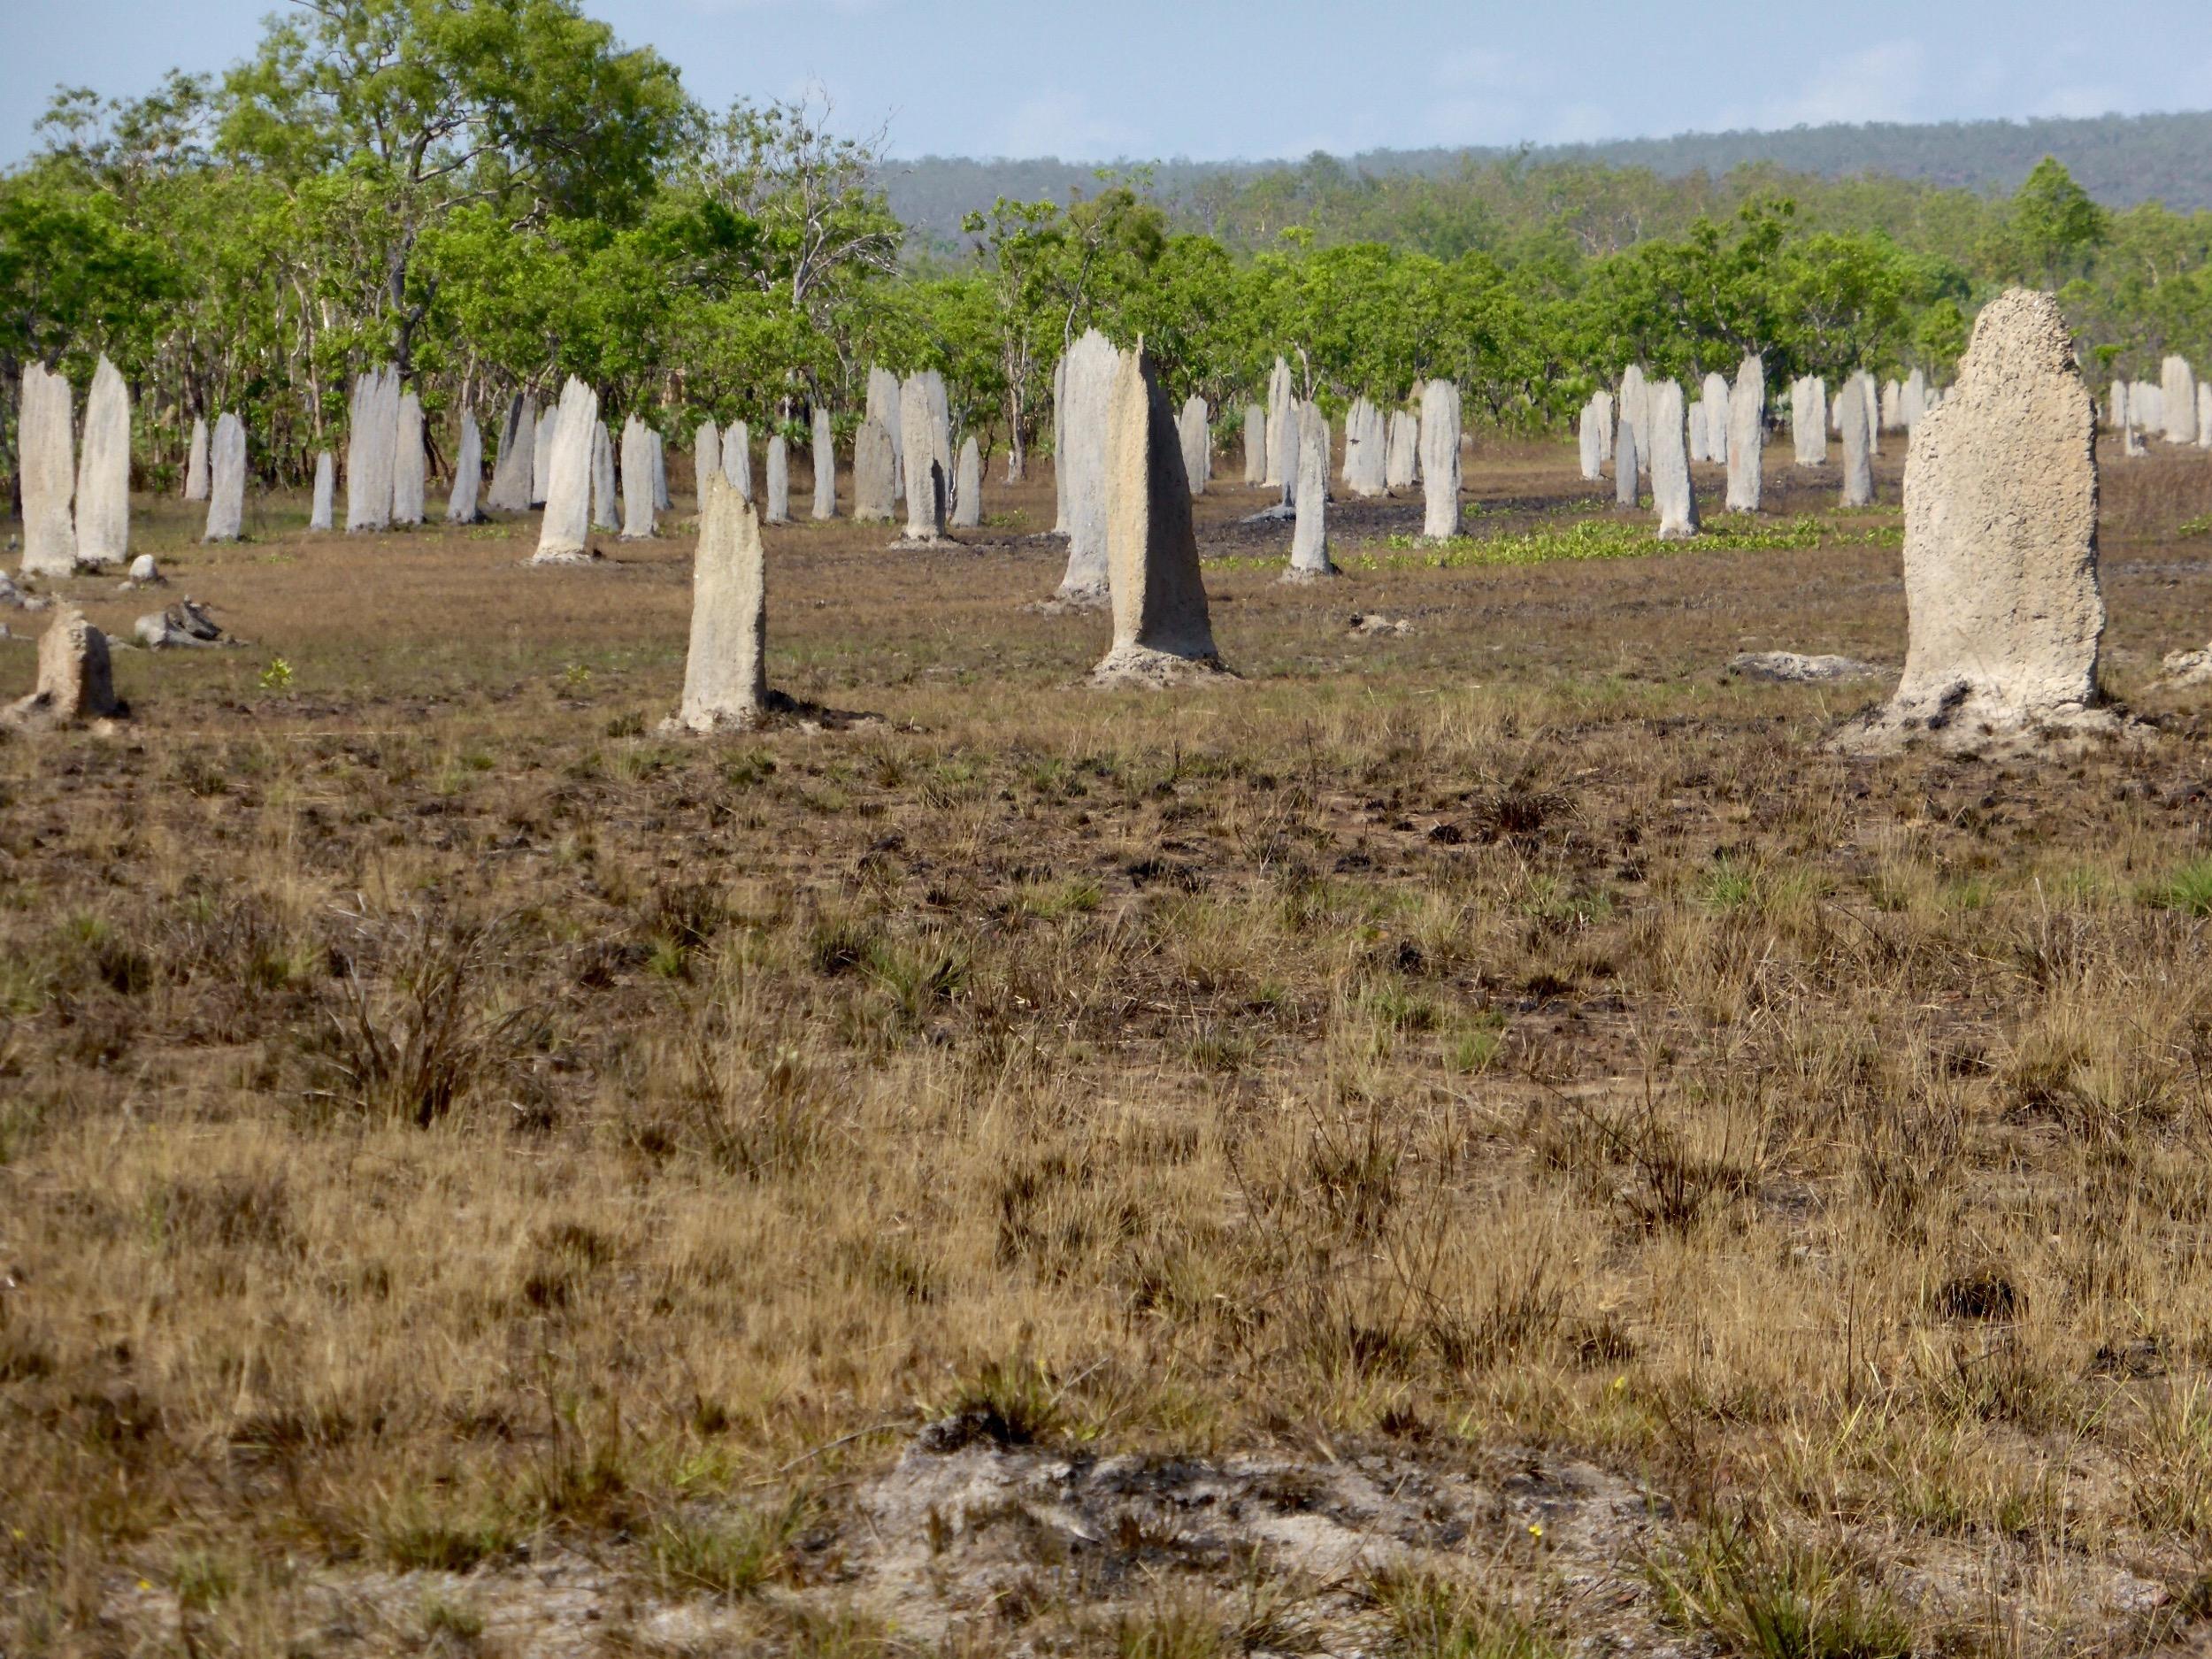 Viewing platform of termite mounds at Litchfield National Park